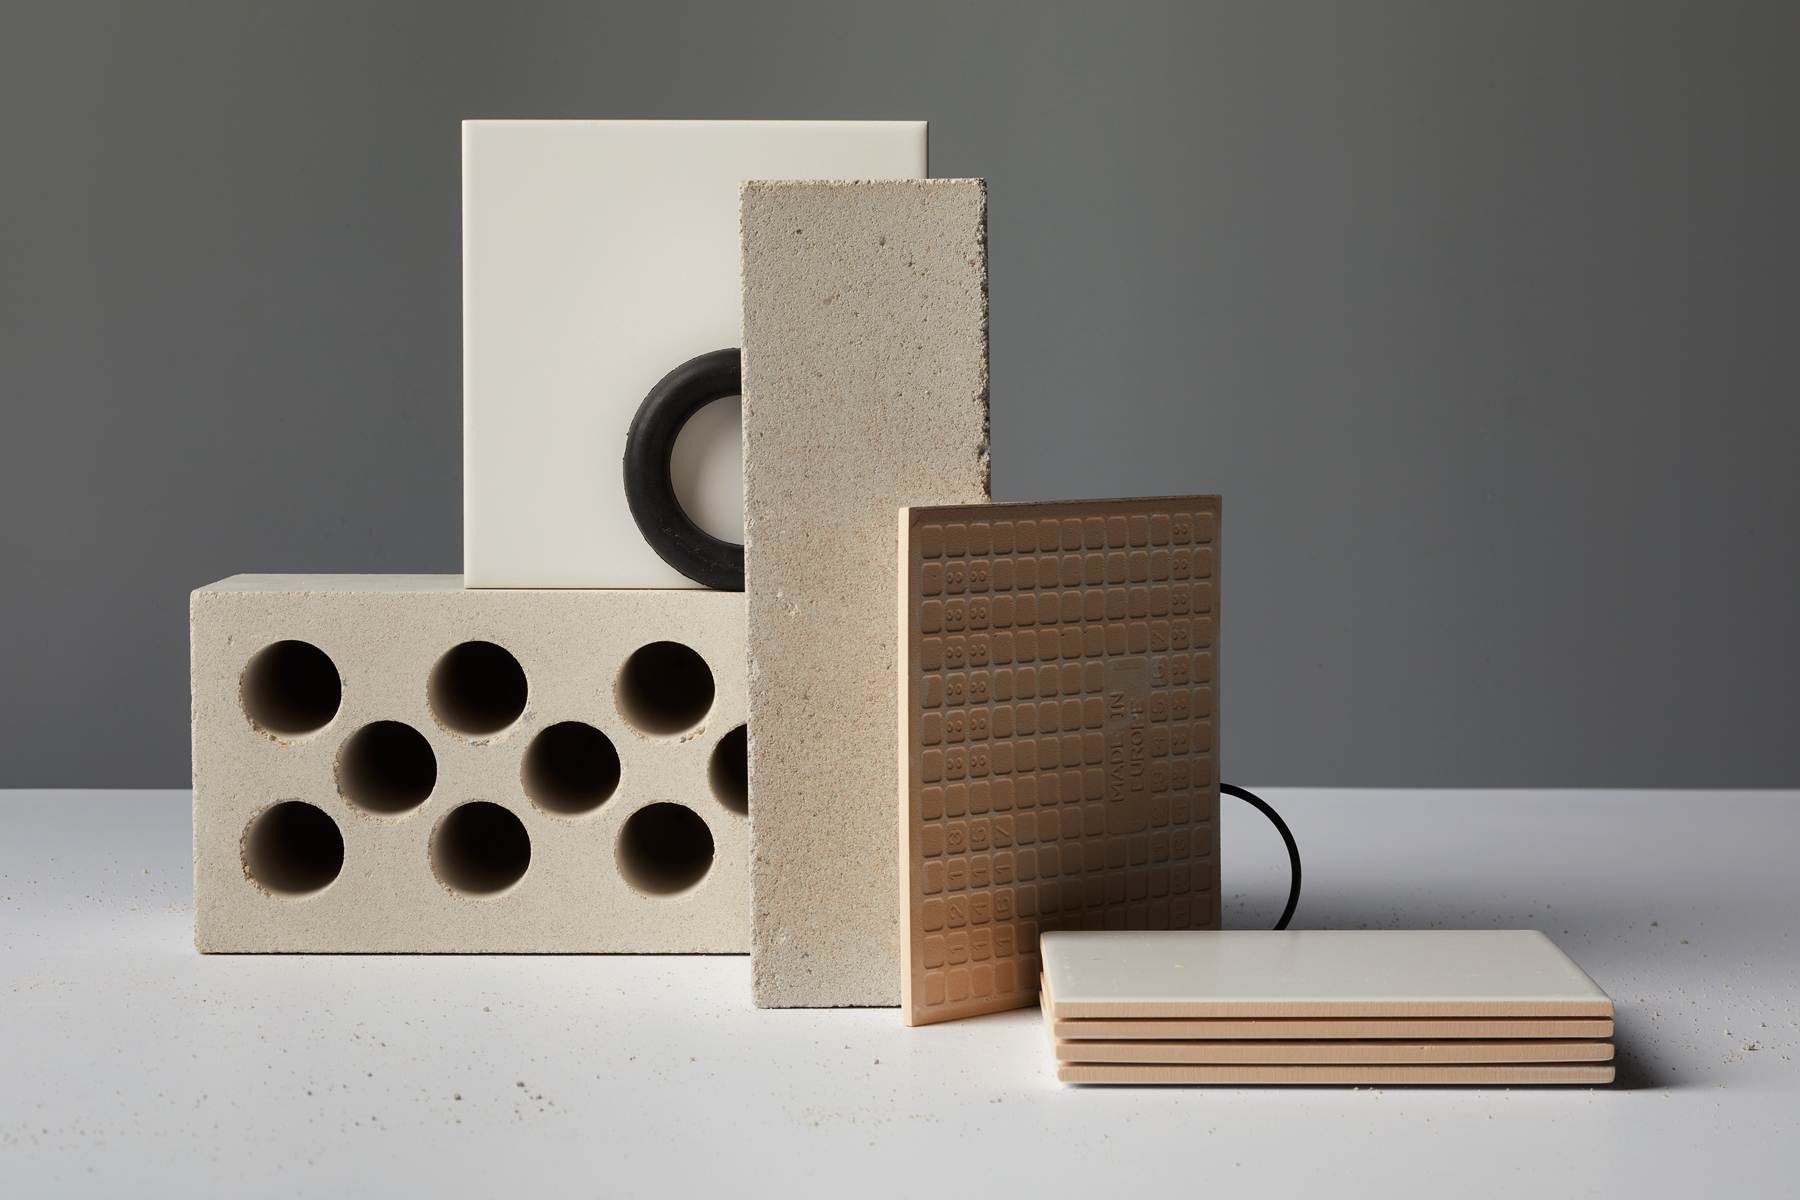 YDI - in collaboration with Nadin Schumacher